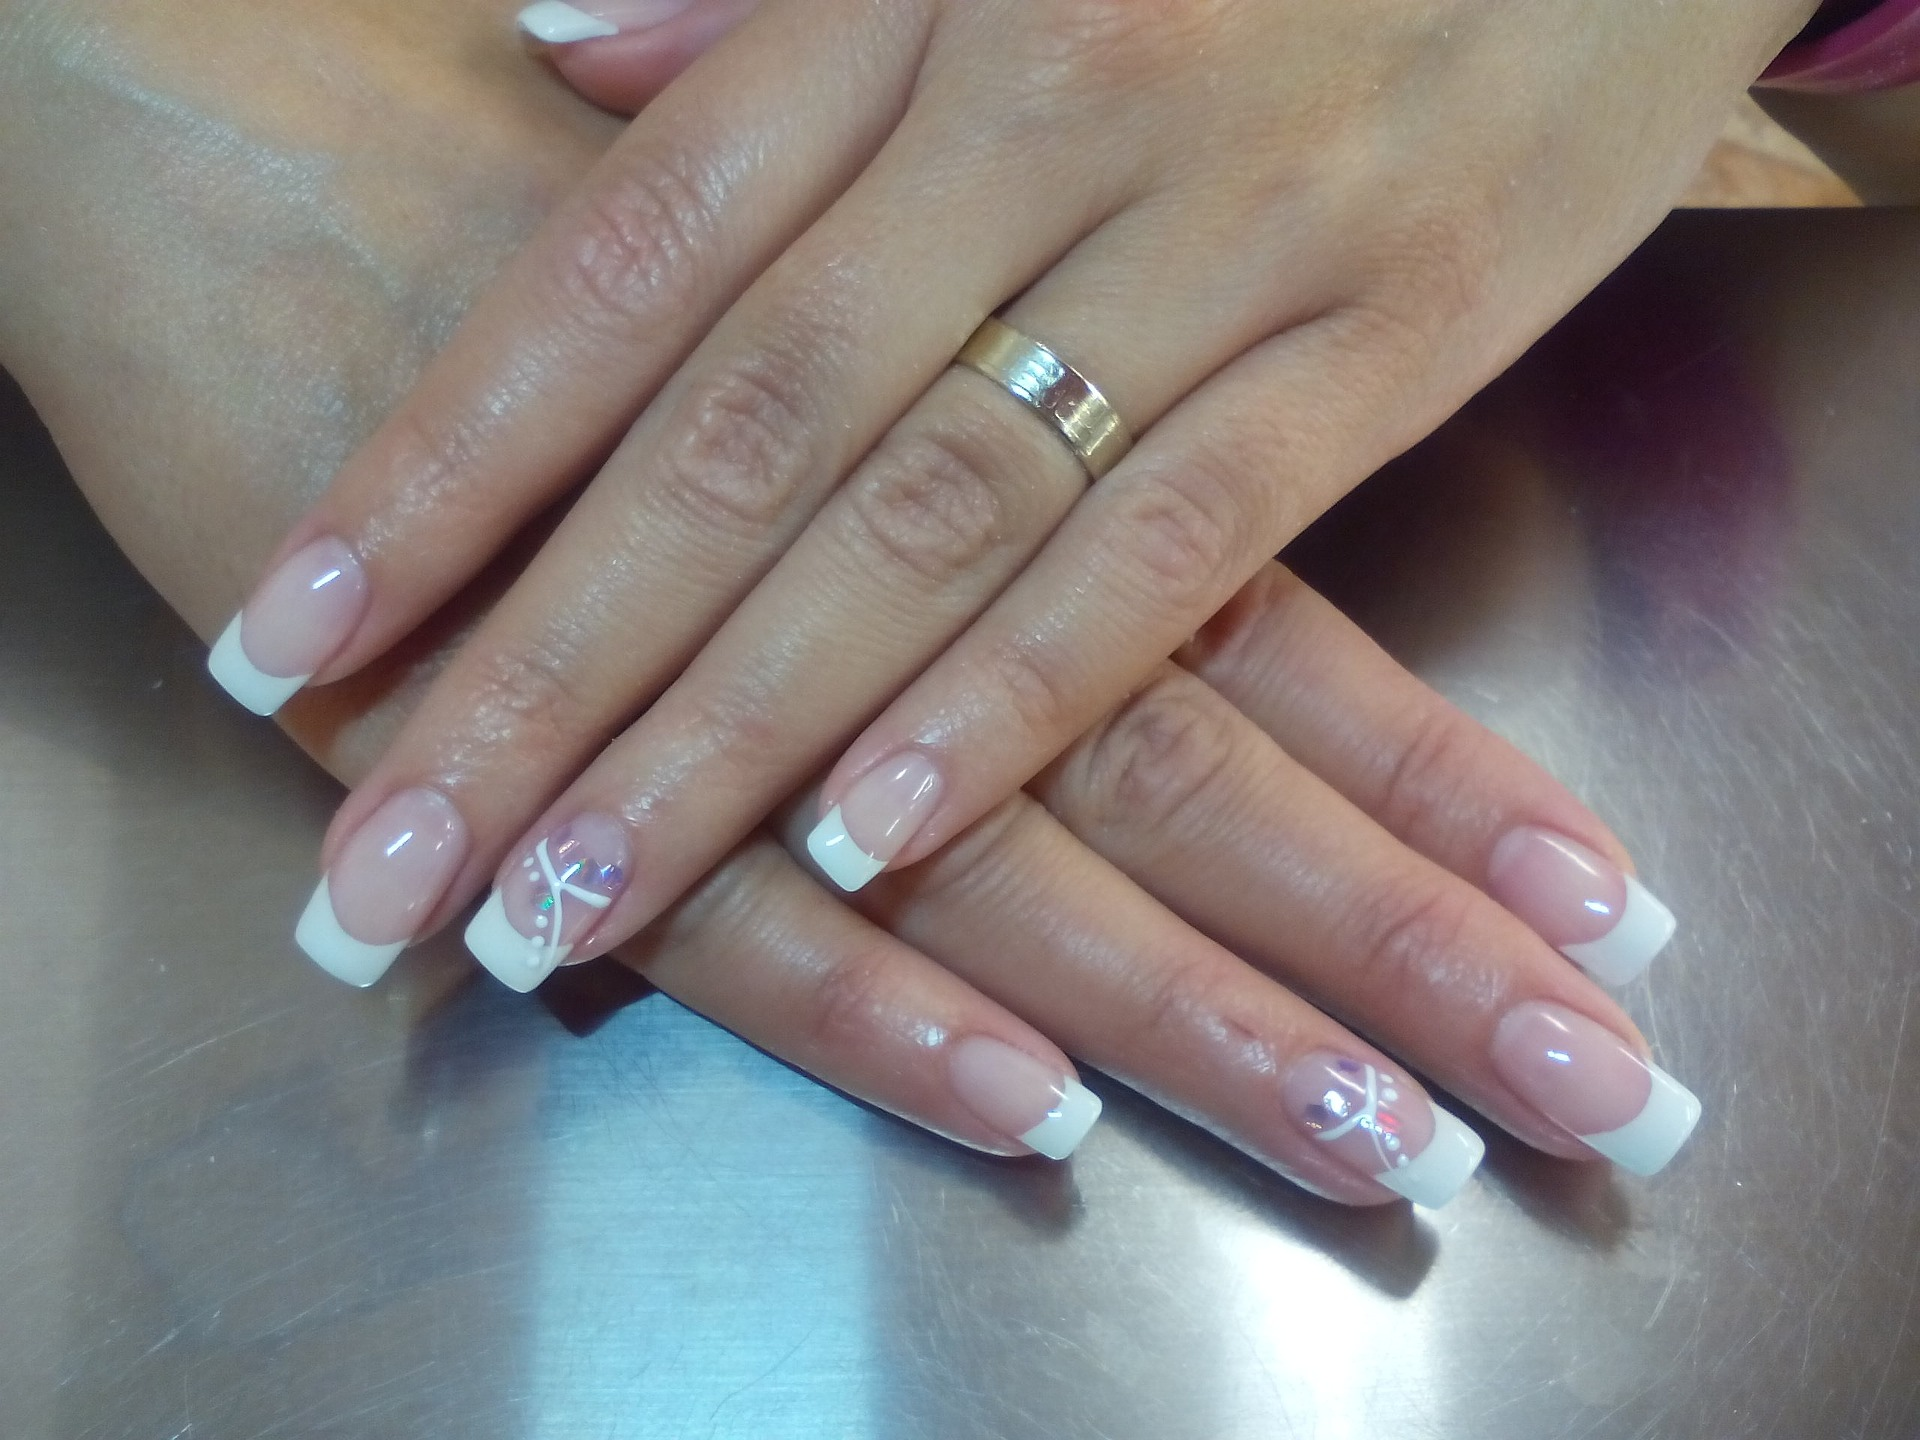 Kvindenegle har fået manicure